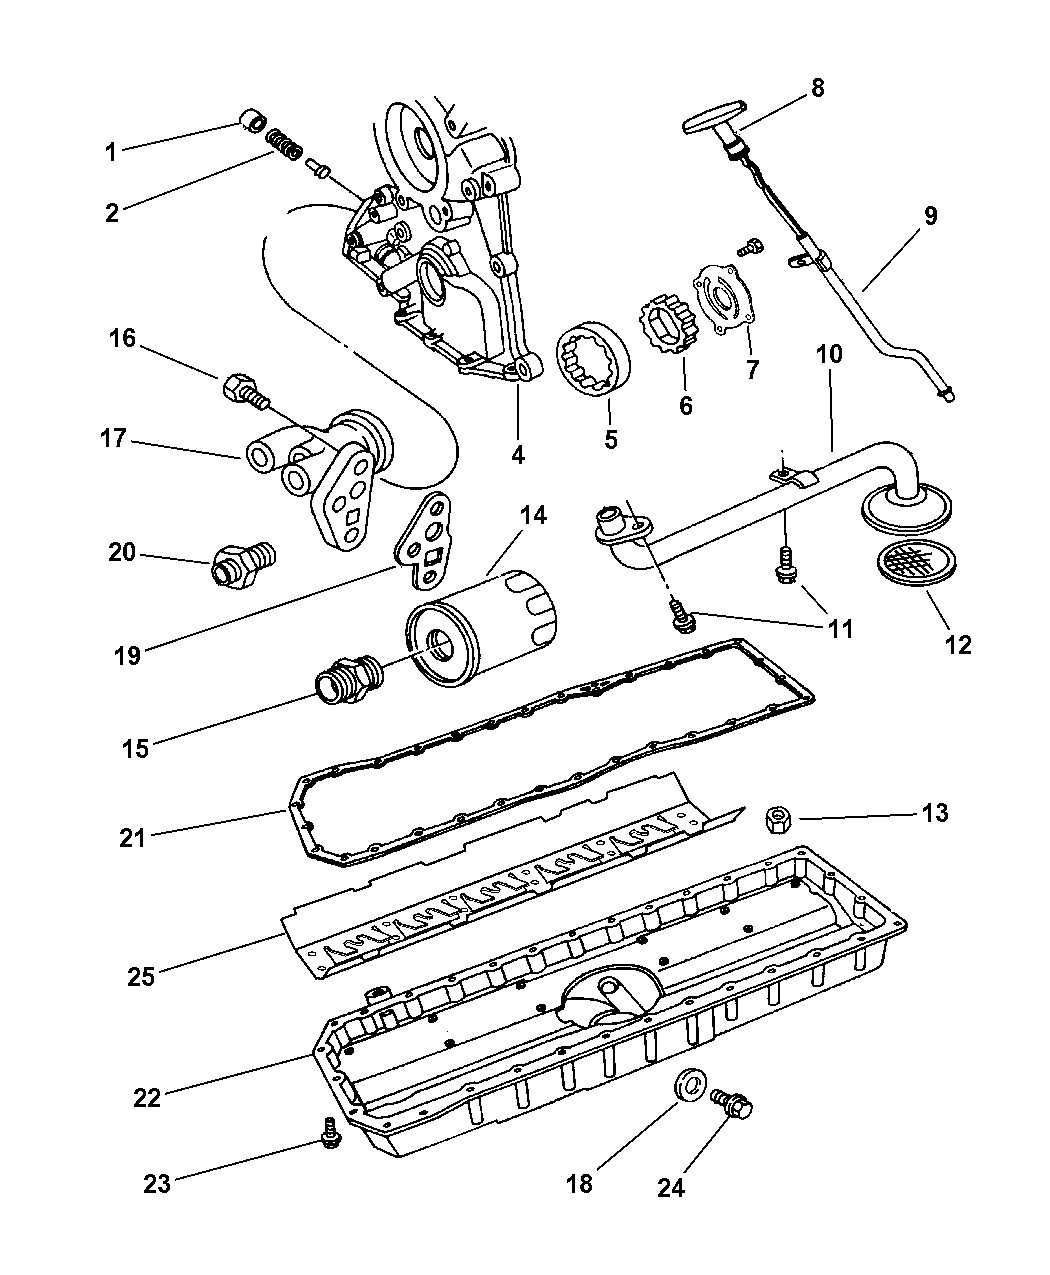 8425b dodge viper engine diagram digital resources dodge viper engine diagram viper engine diagram #1